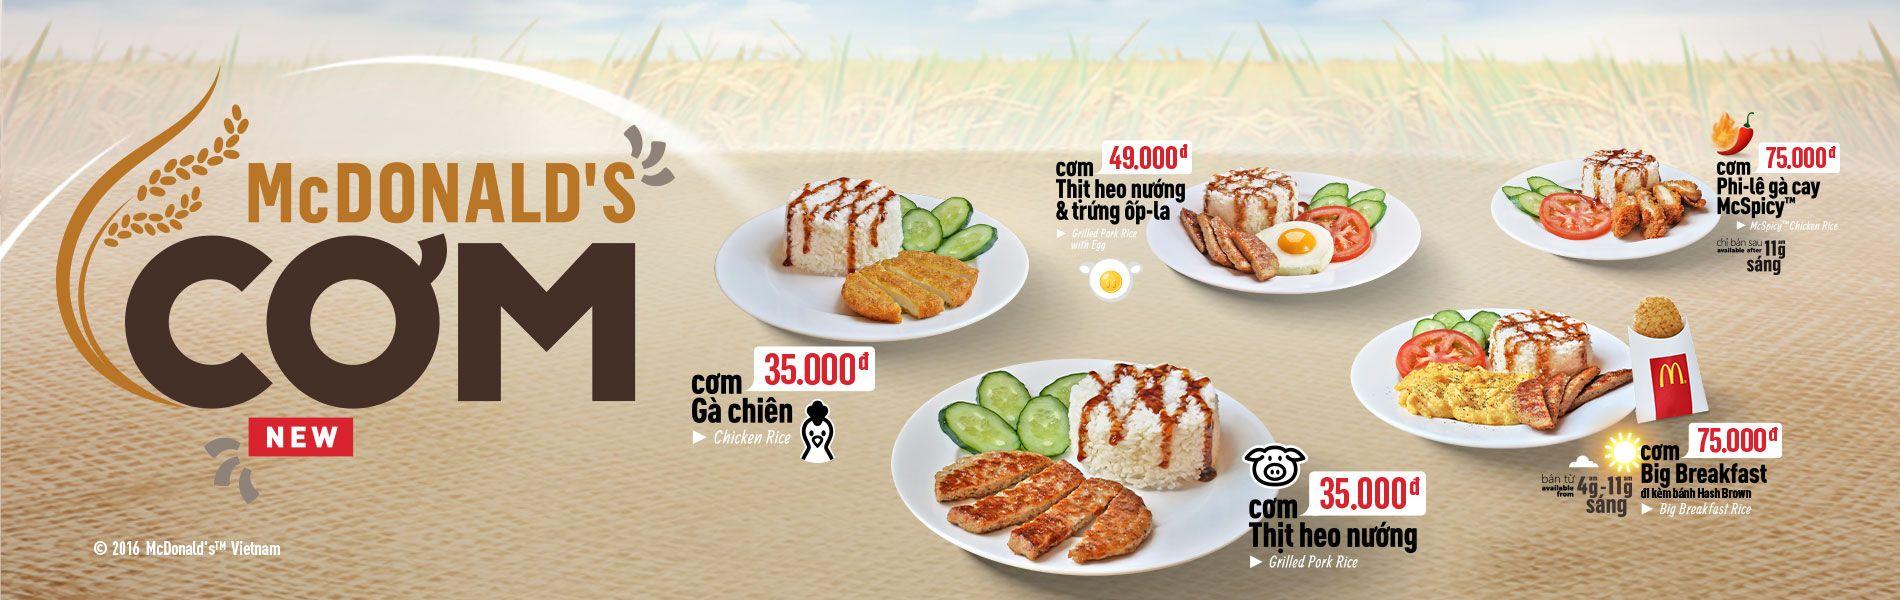 Pin By Dennis Phan On Posm Big Breakfast Food Fast Food